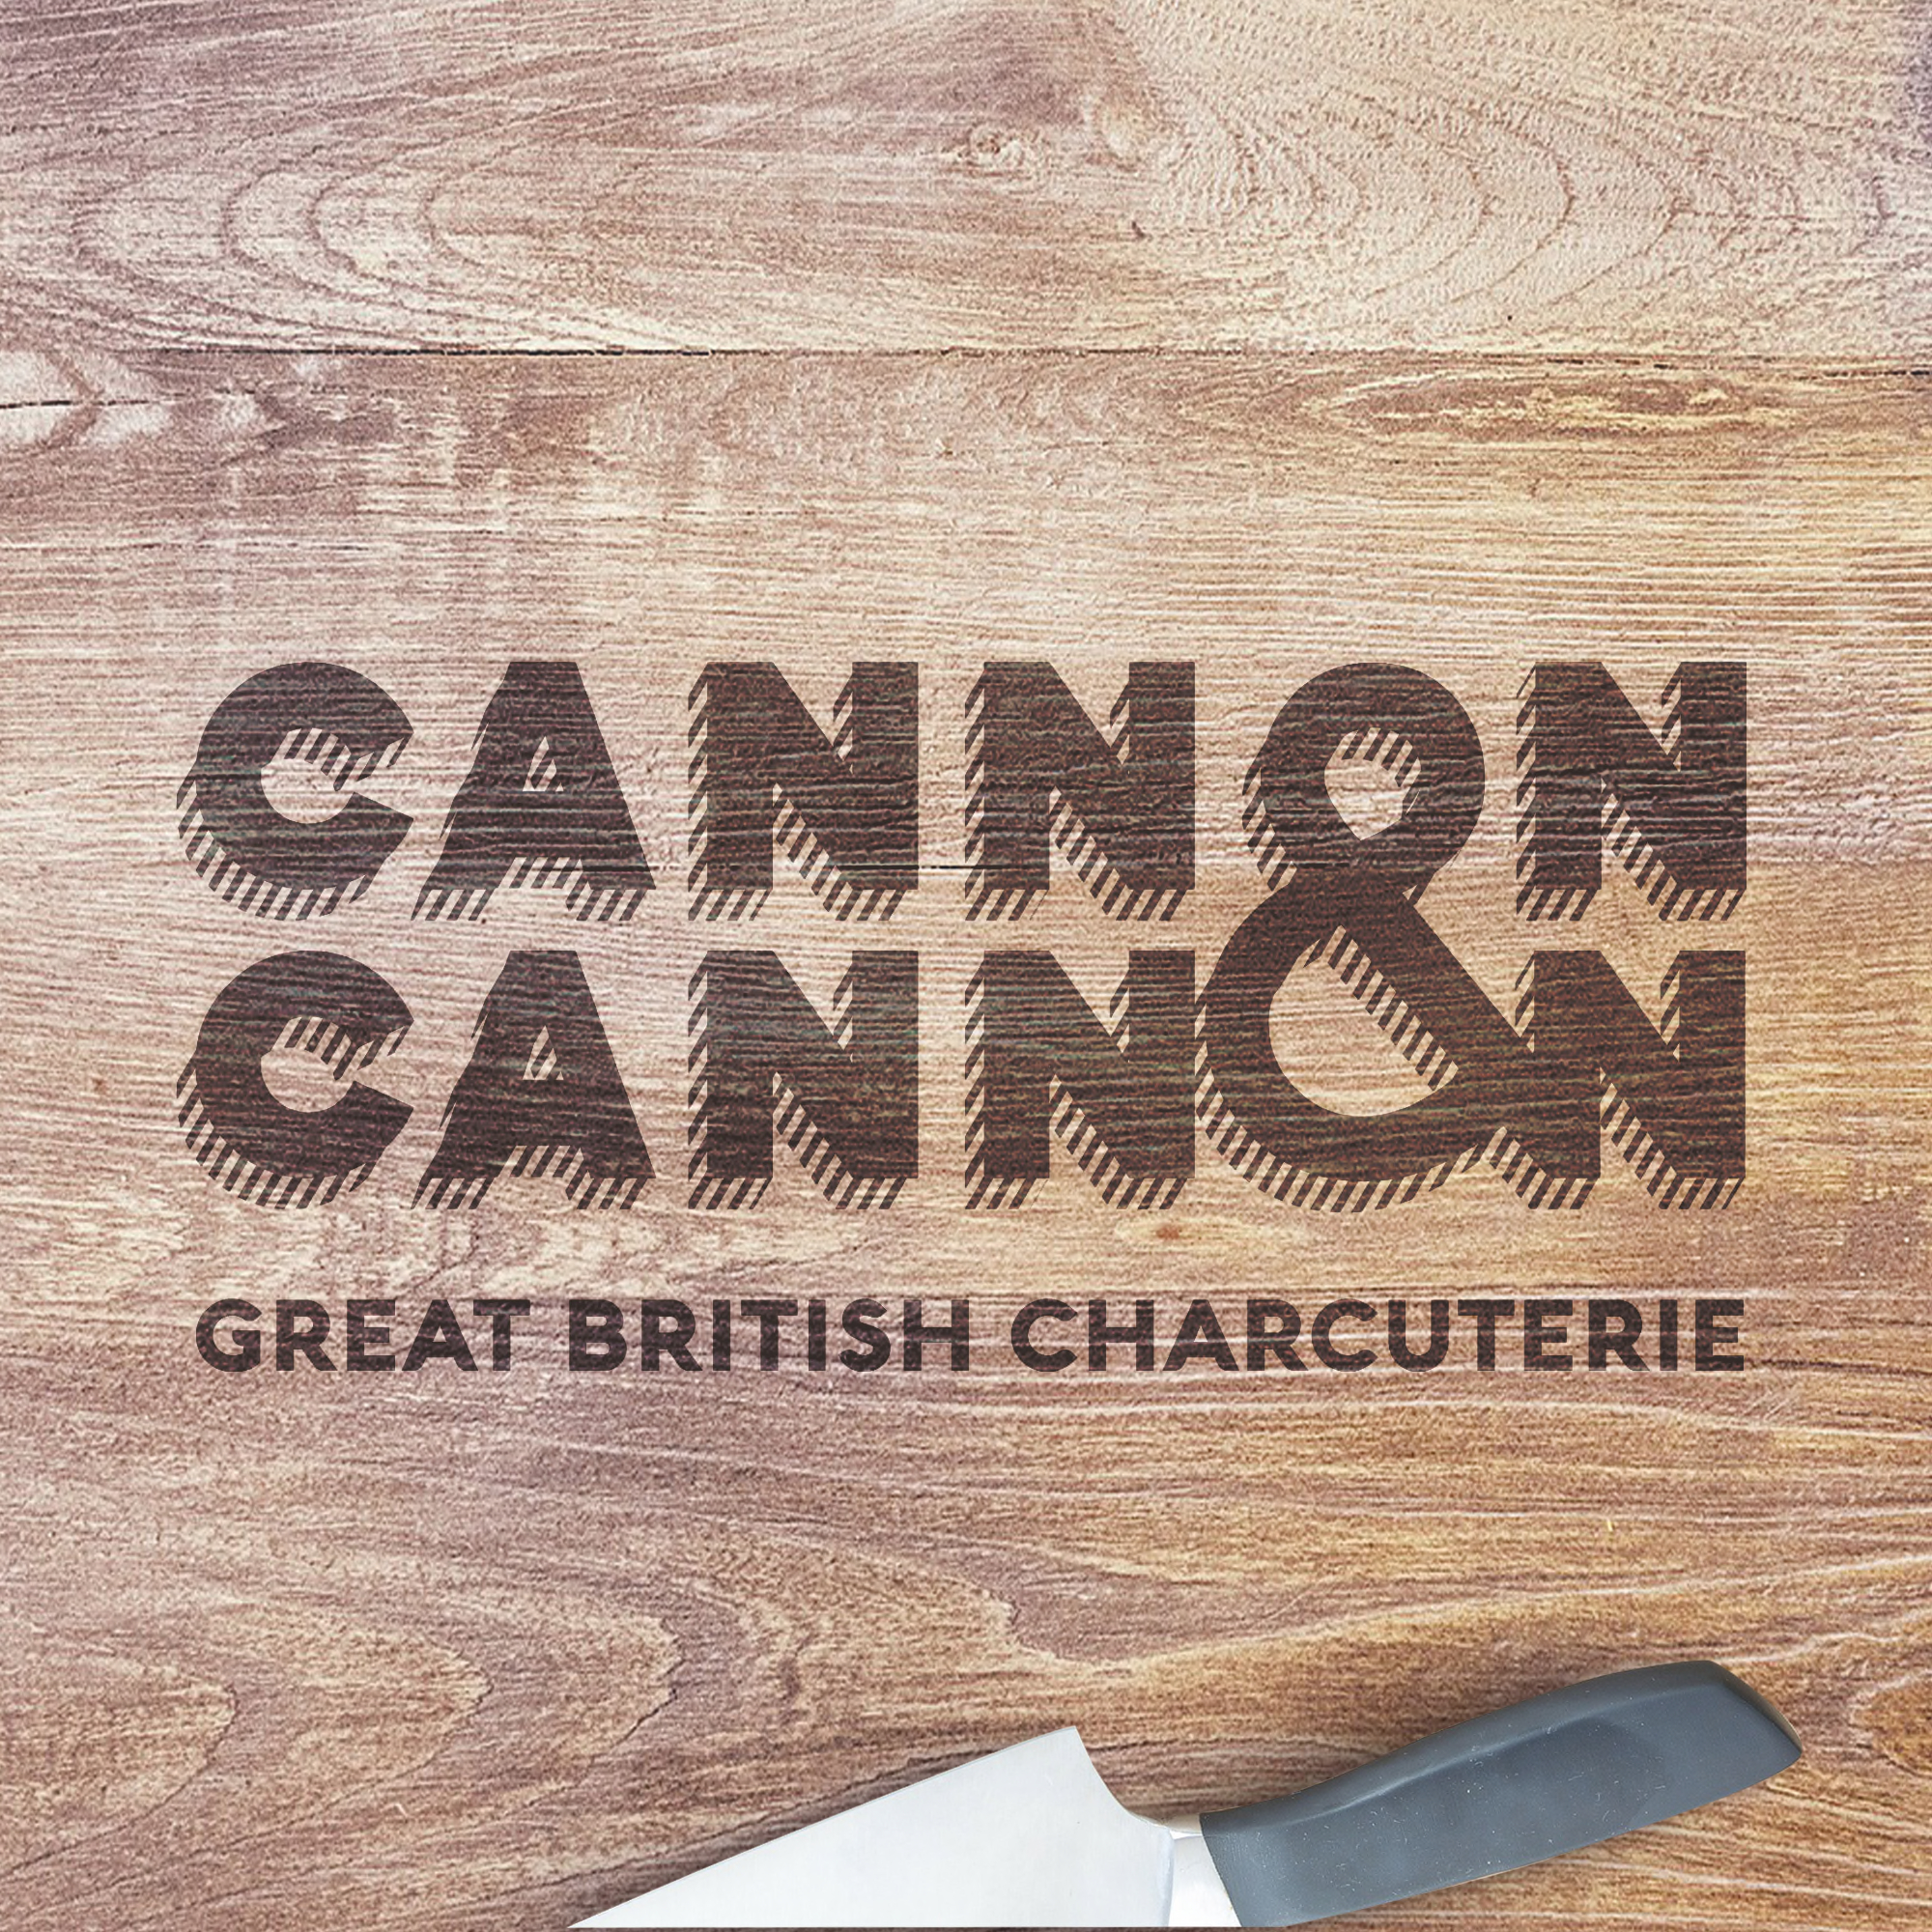 The Space Creative - Cannon & Cannon Rebrand1.jpg